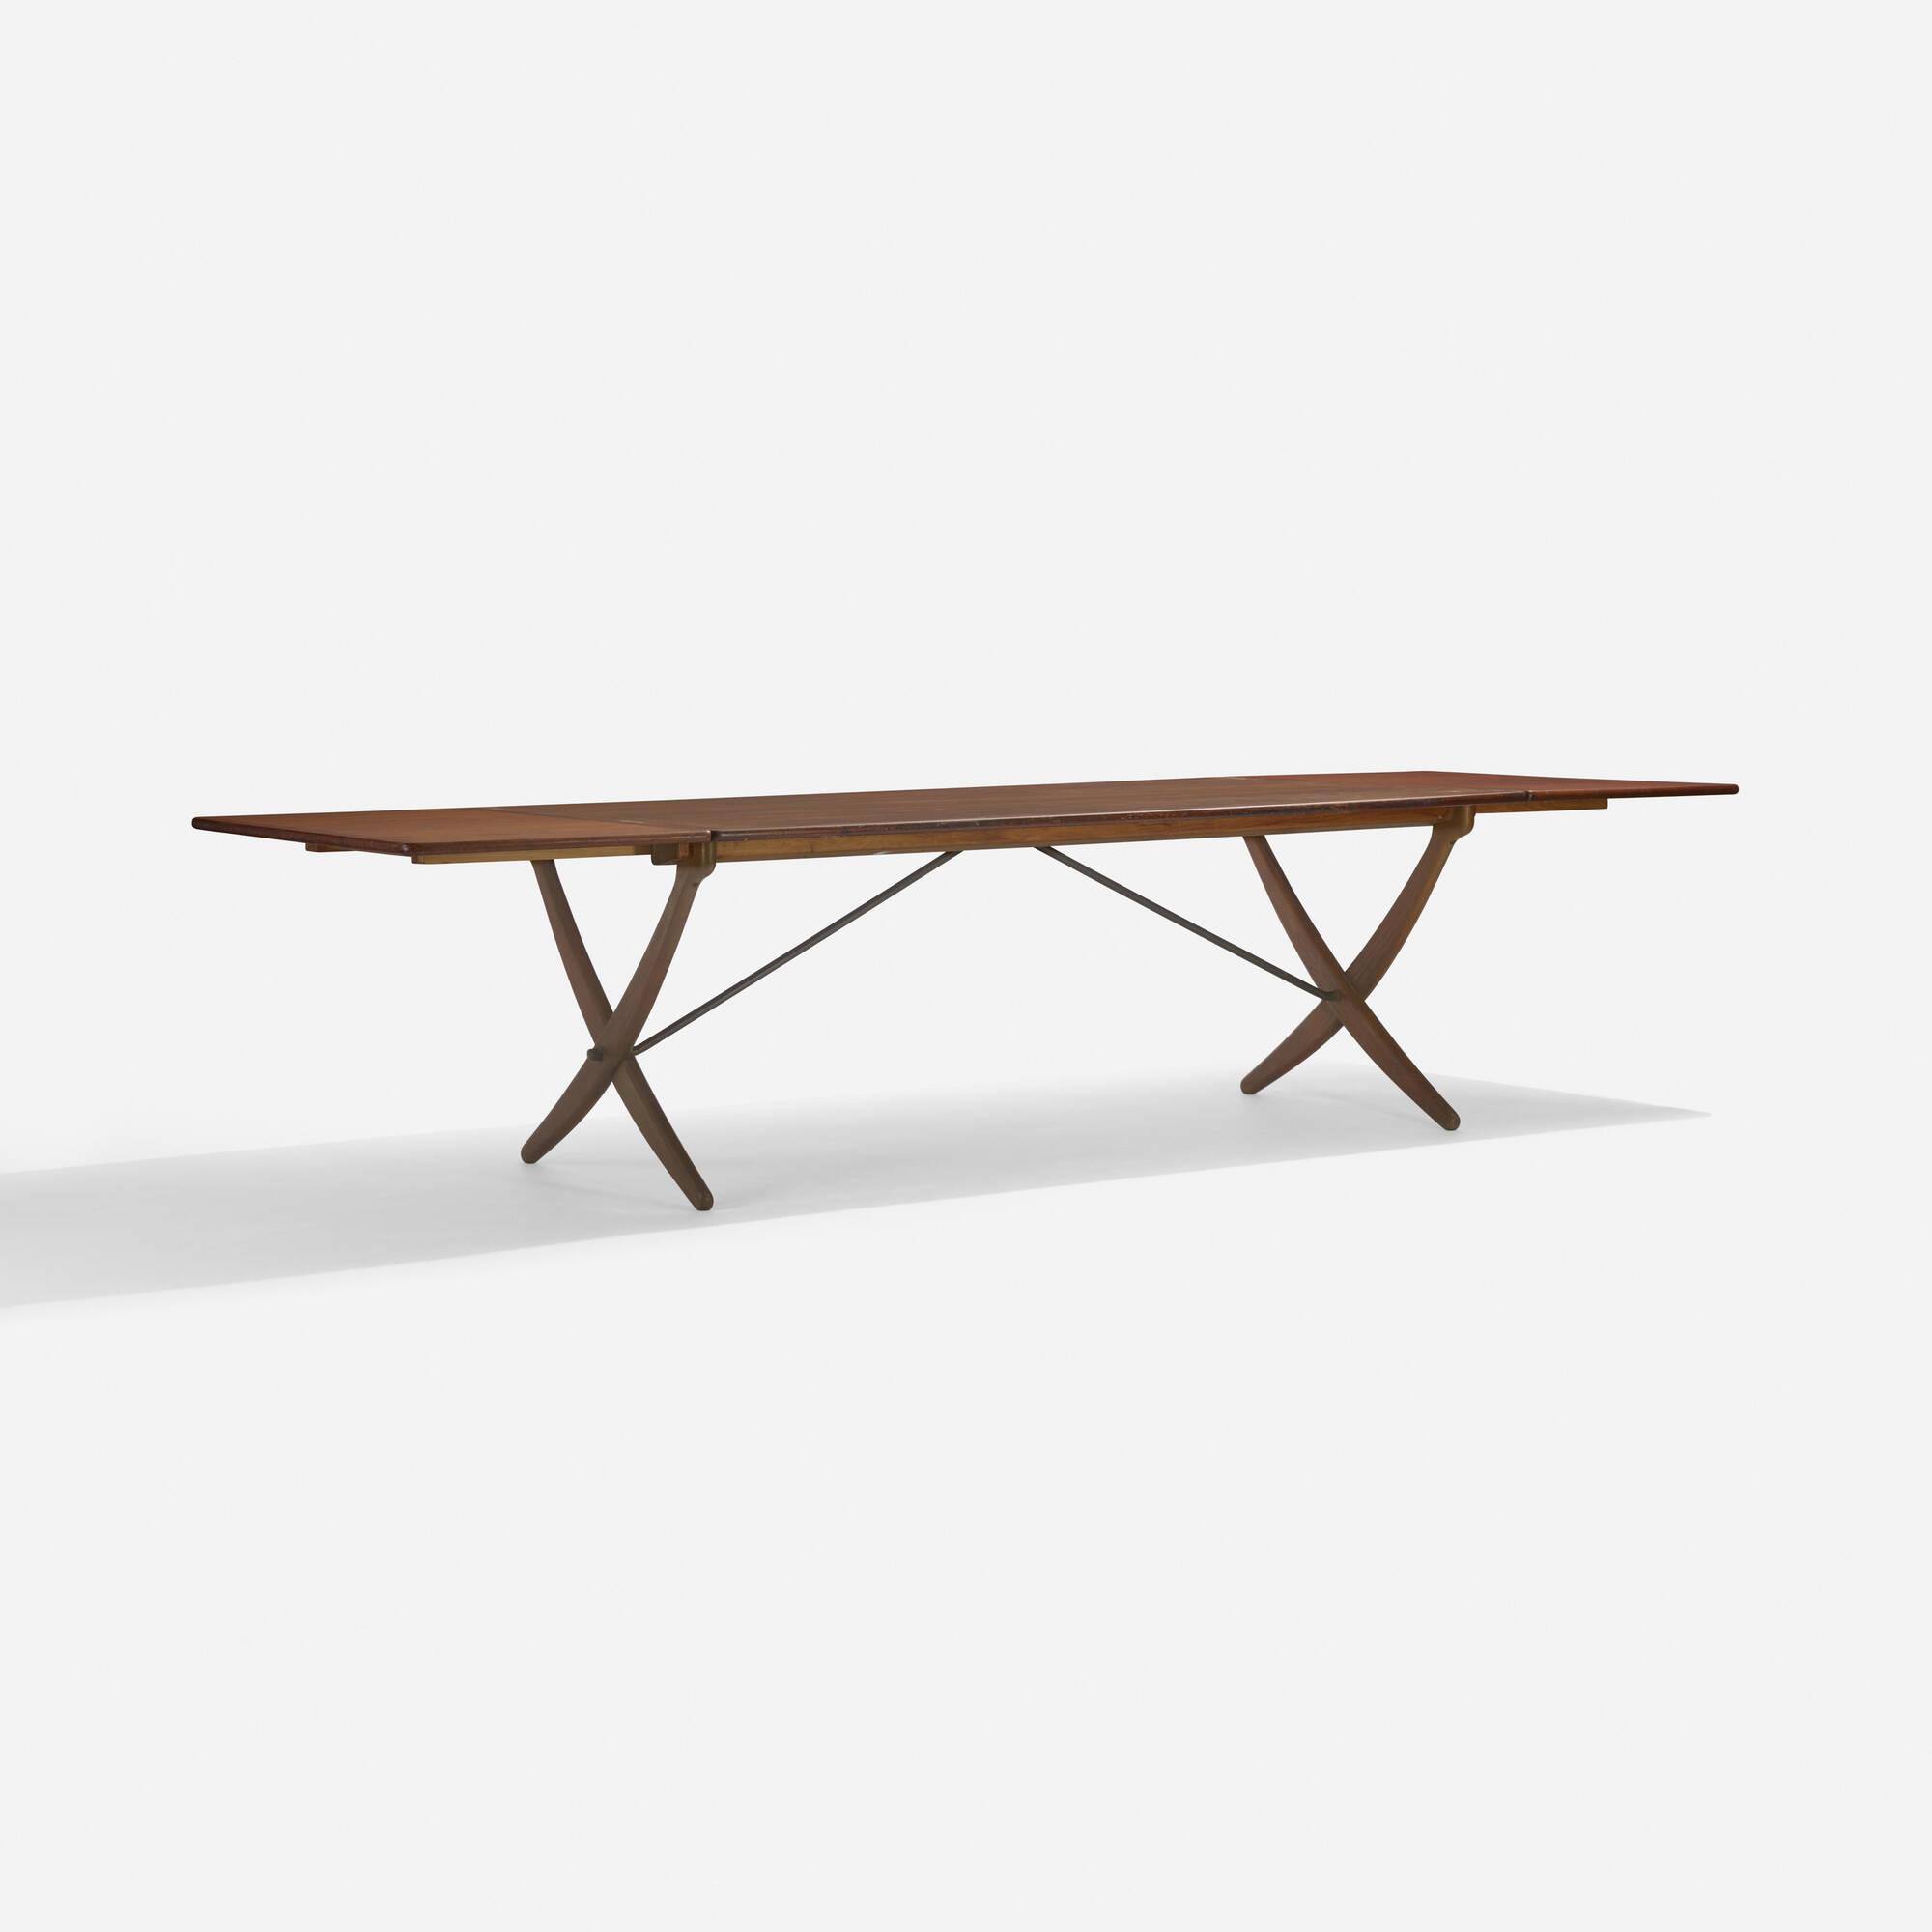 101: Hans J. Wegner / drop-leaf dining table, model AT304 (3 of 3)